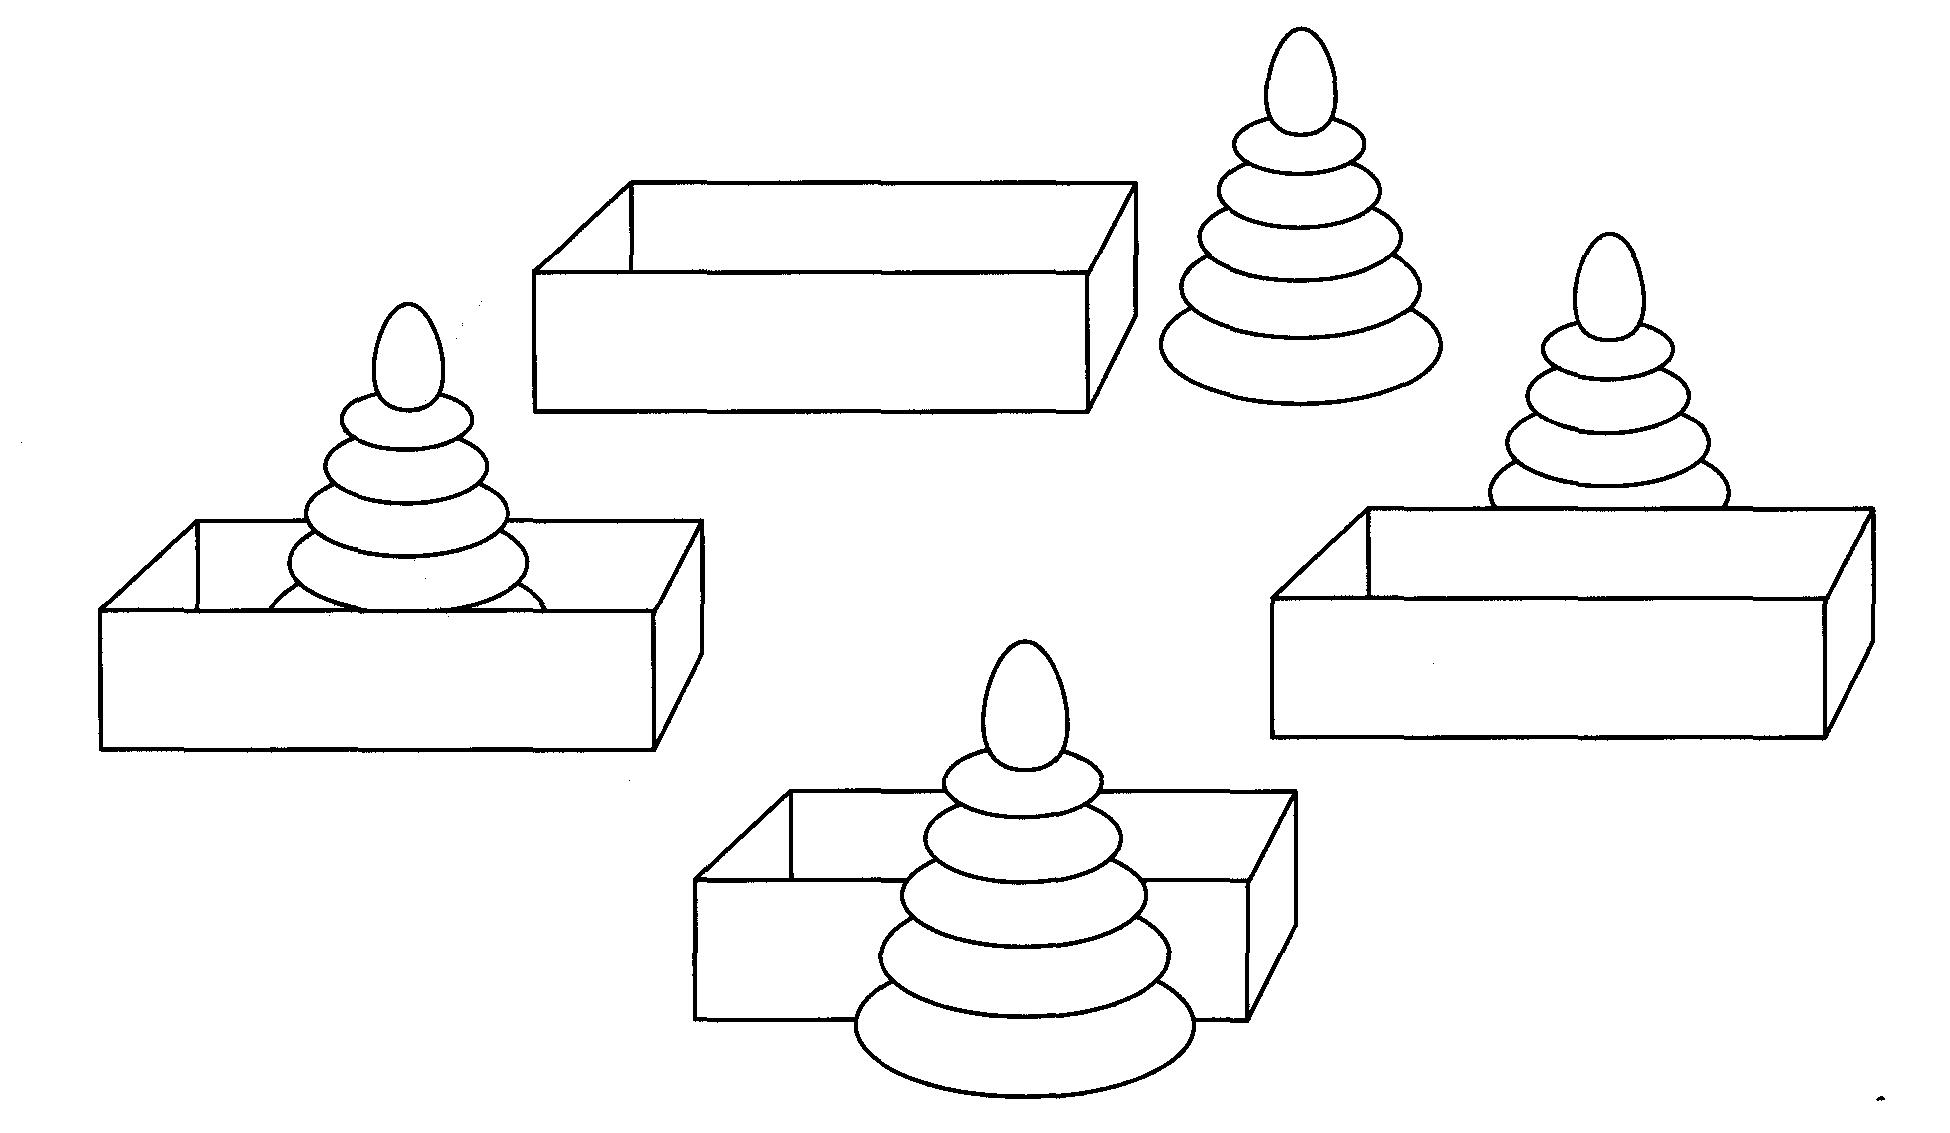 http://lib.exdat.com/tw_files2/urls_14/5/d-4250/7z-docs/1_html_65a0b011.png